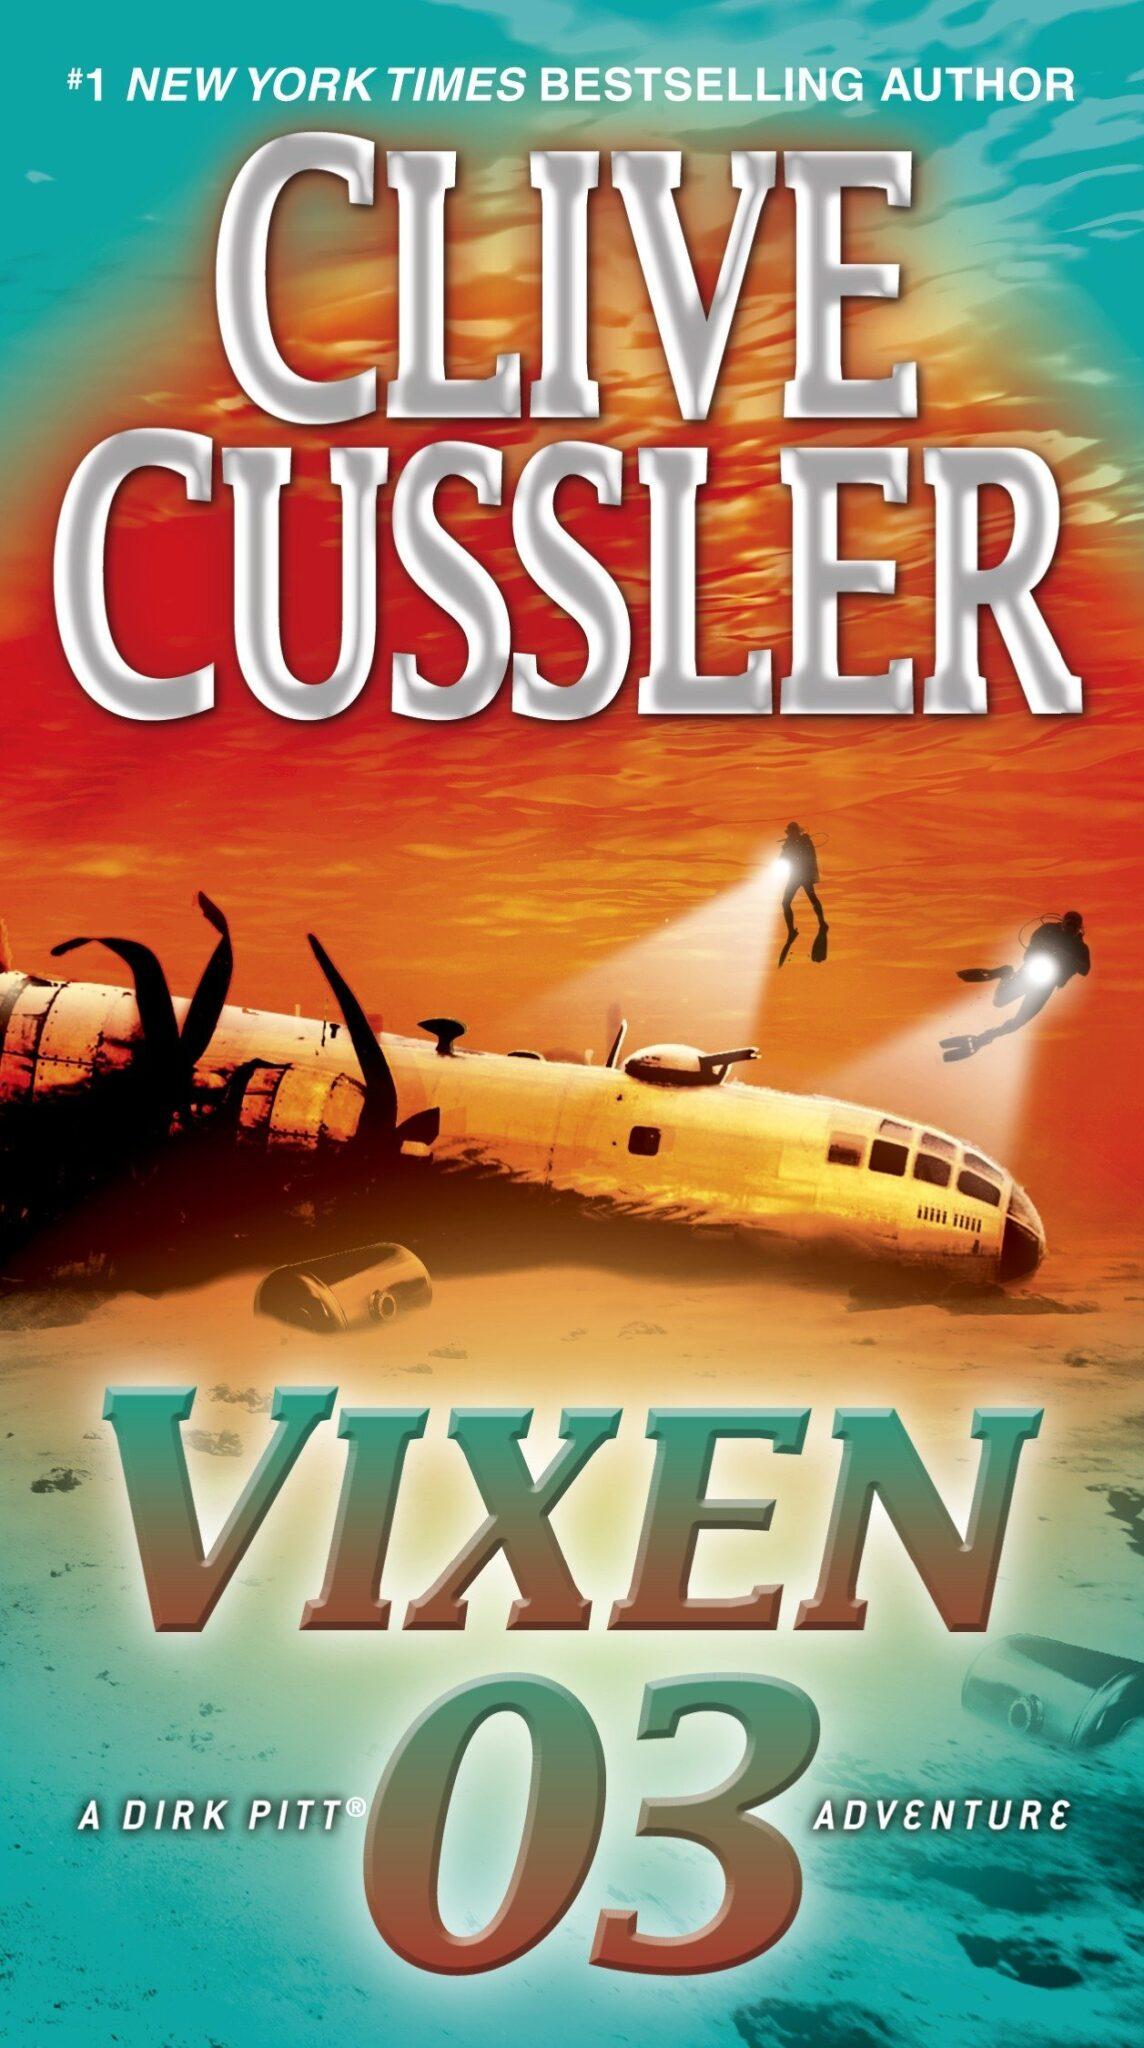 Clive Cussler books 5